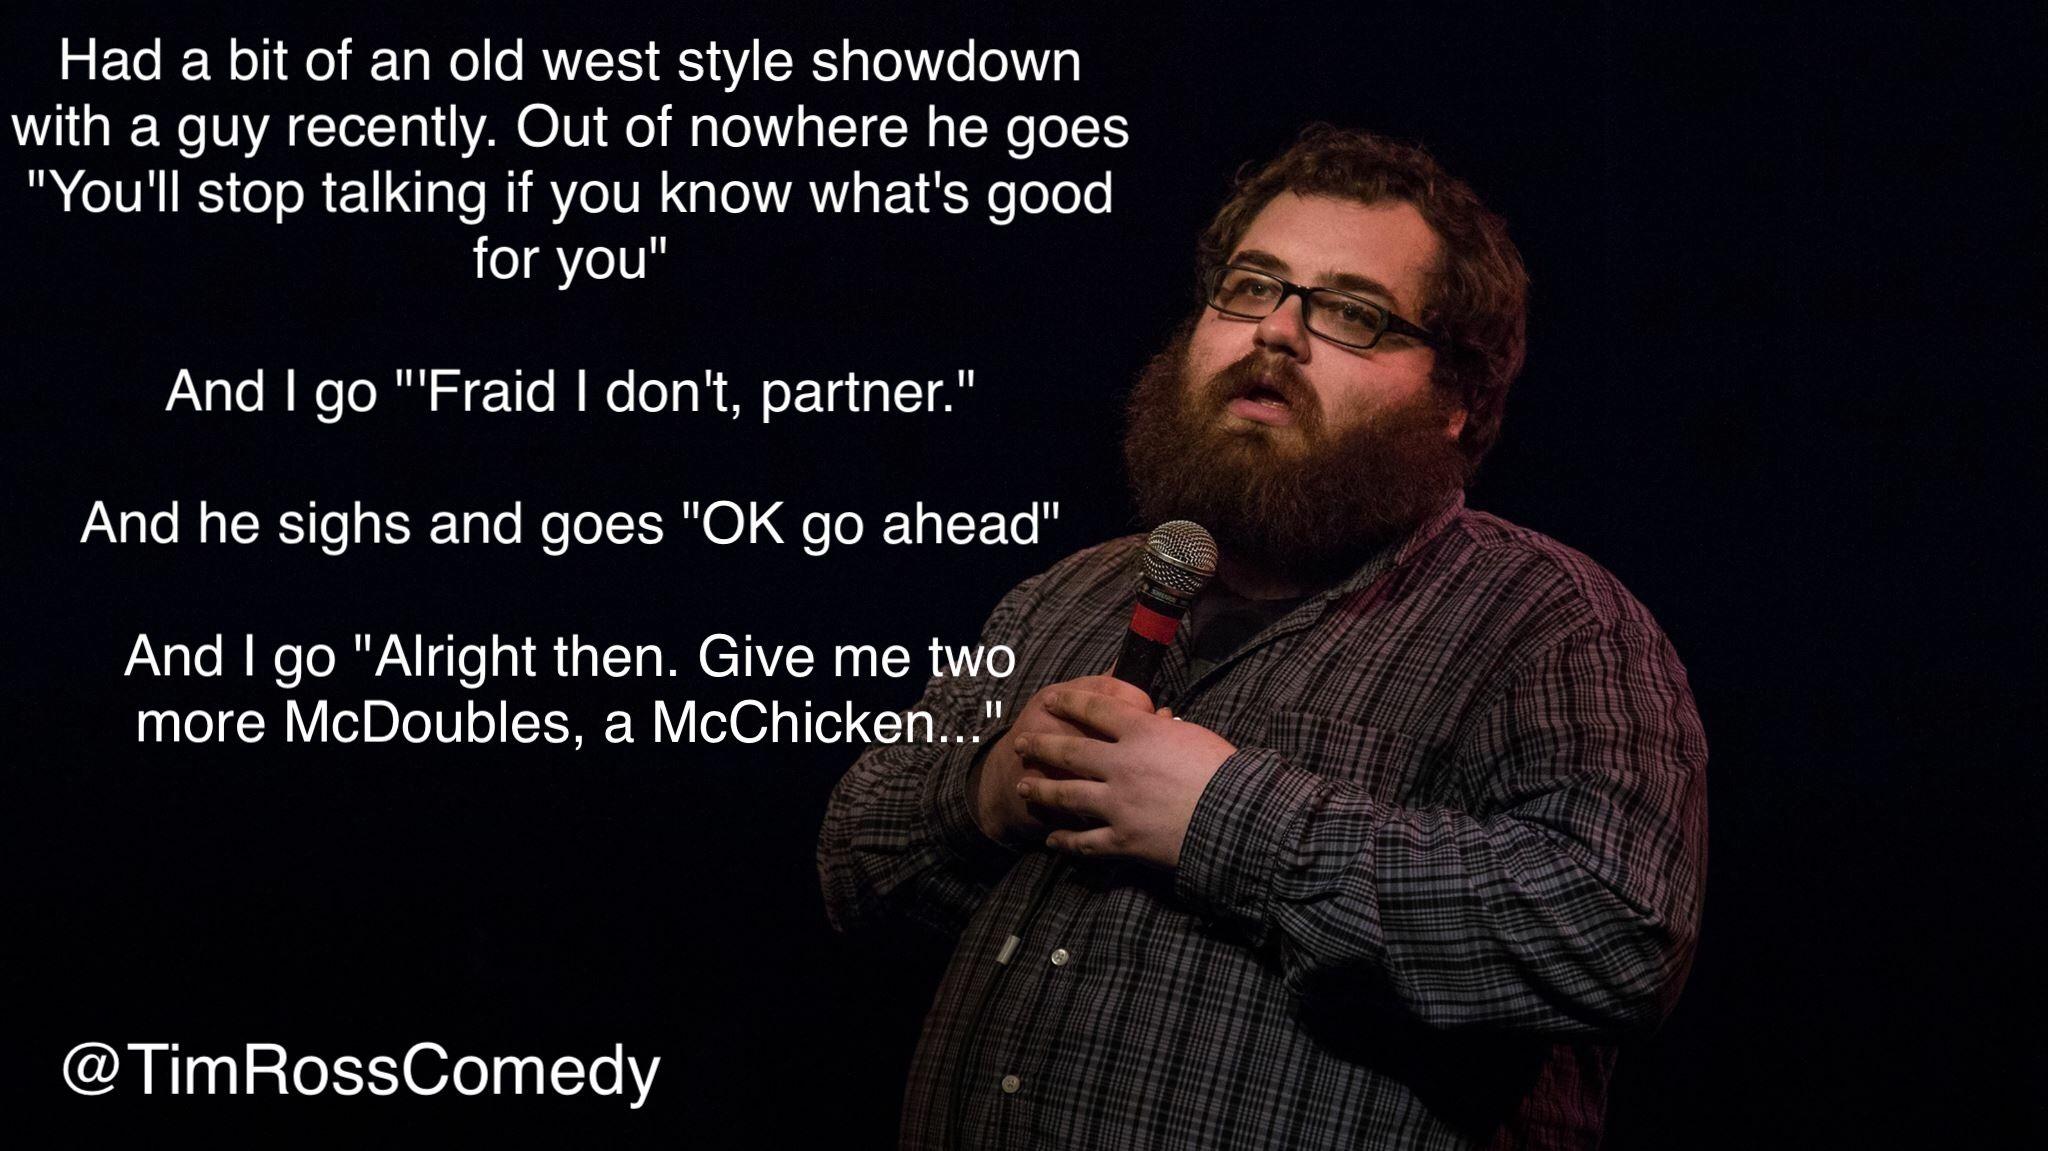 Timross Comedian Comedy Funny Standup Jokes Fun Comic Lol Joke Humor Funny Memes Comedians Funny Quotes